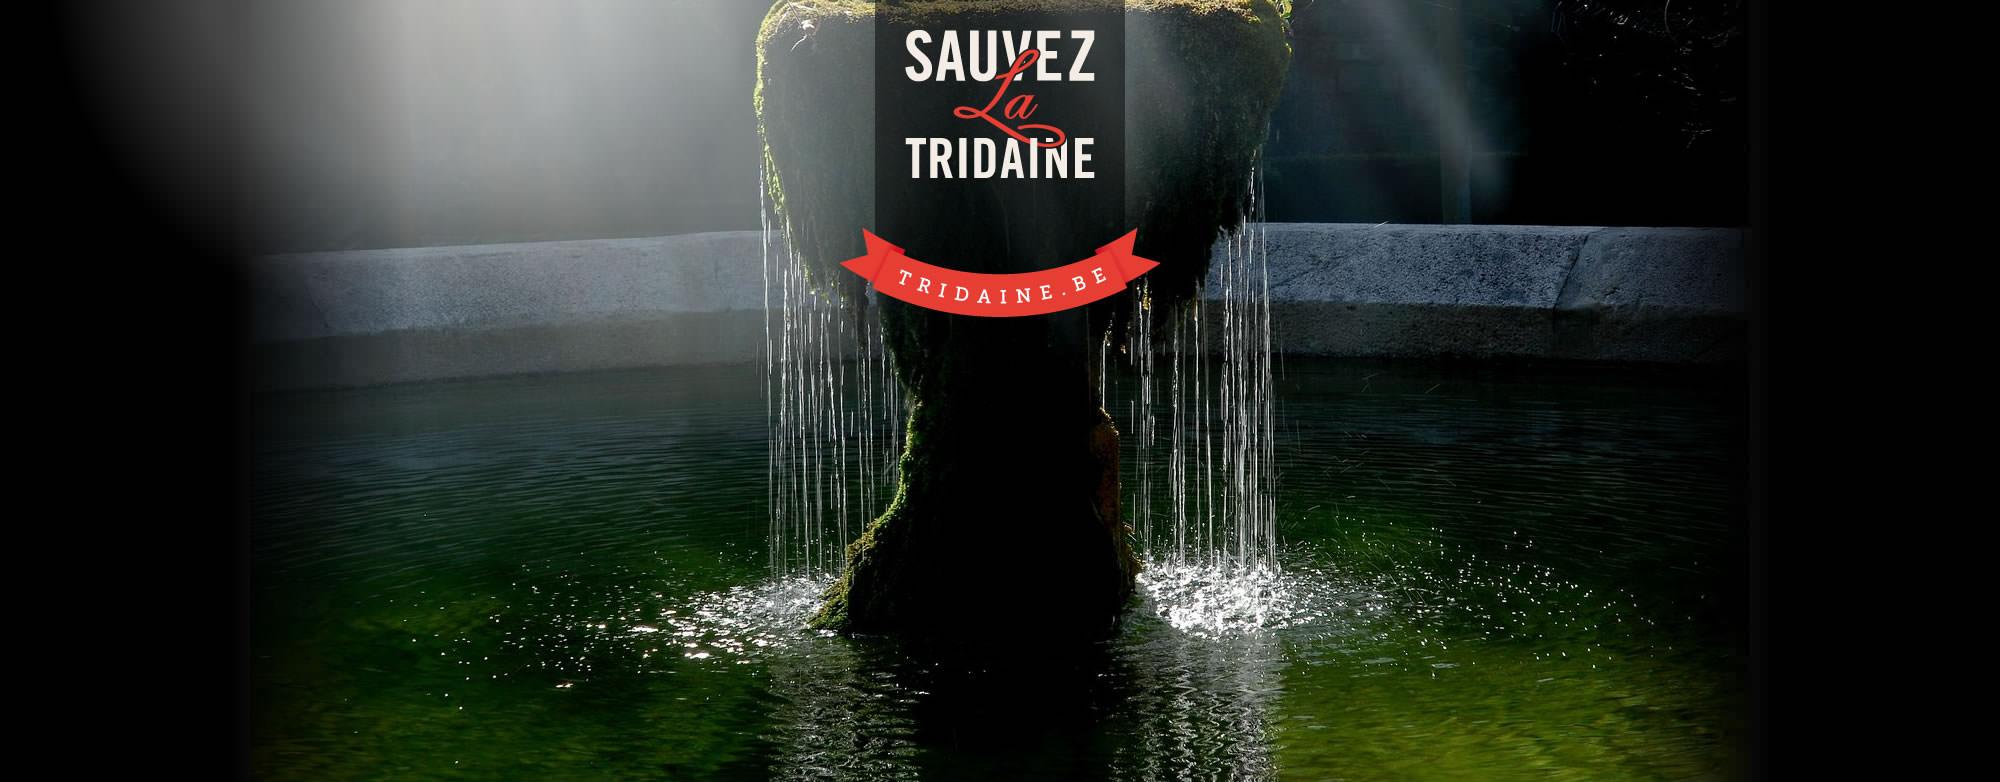 Sauvez la Tridaine